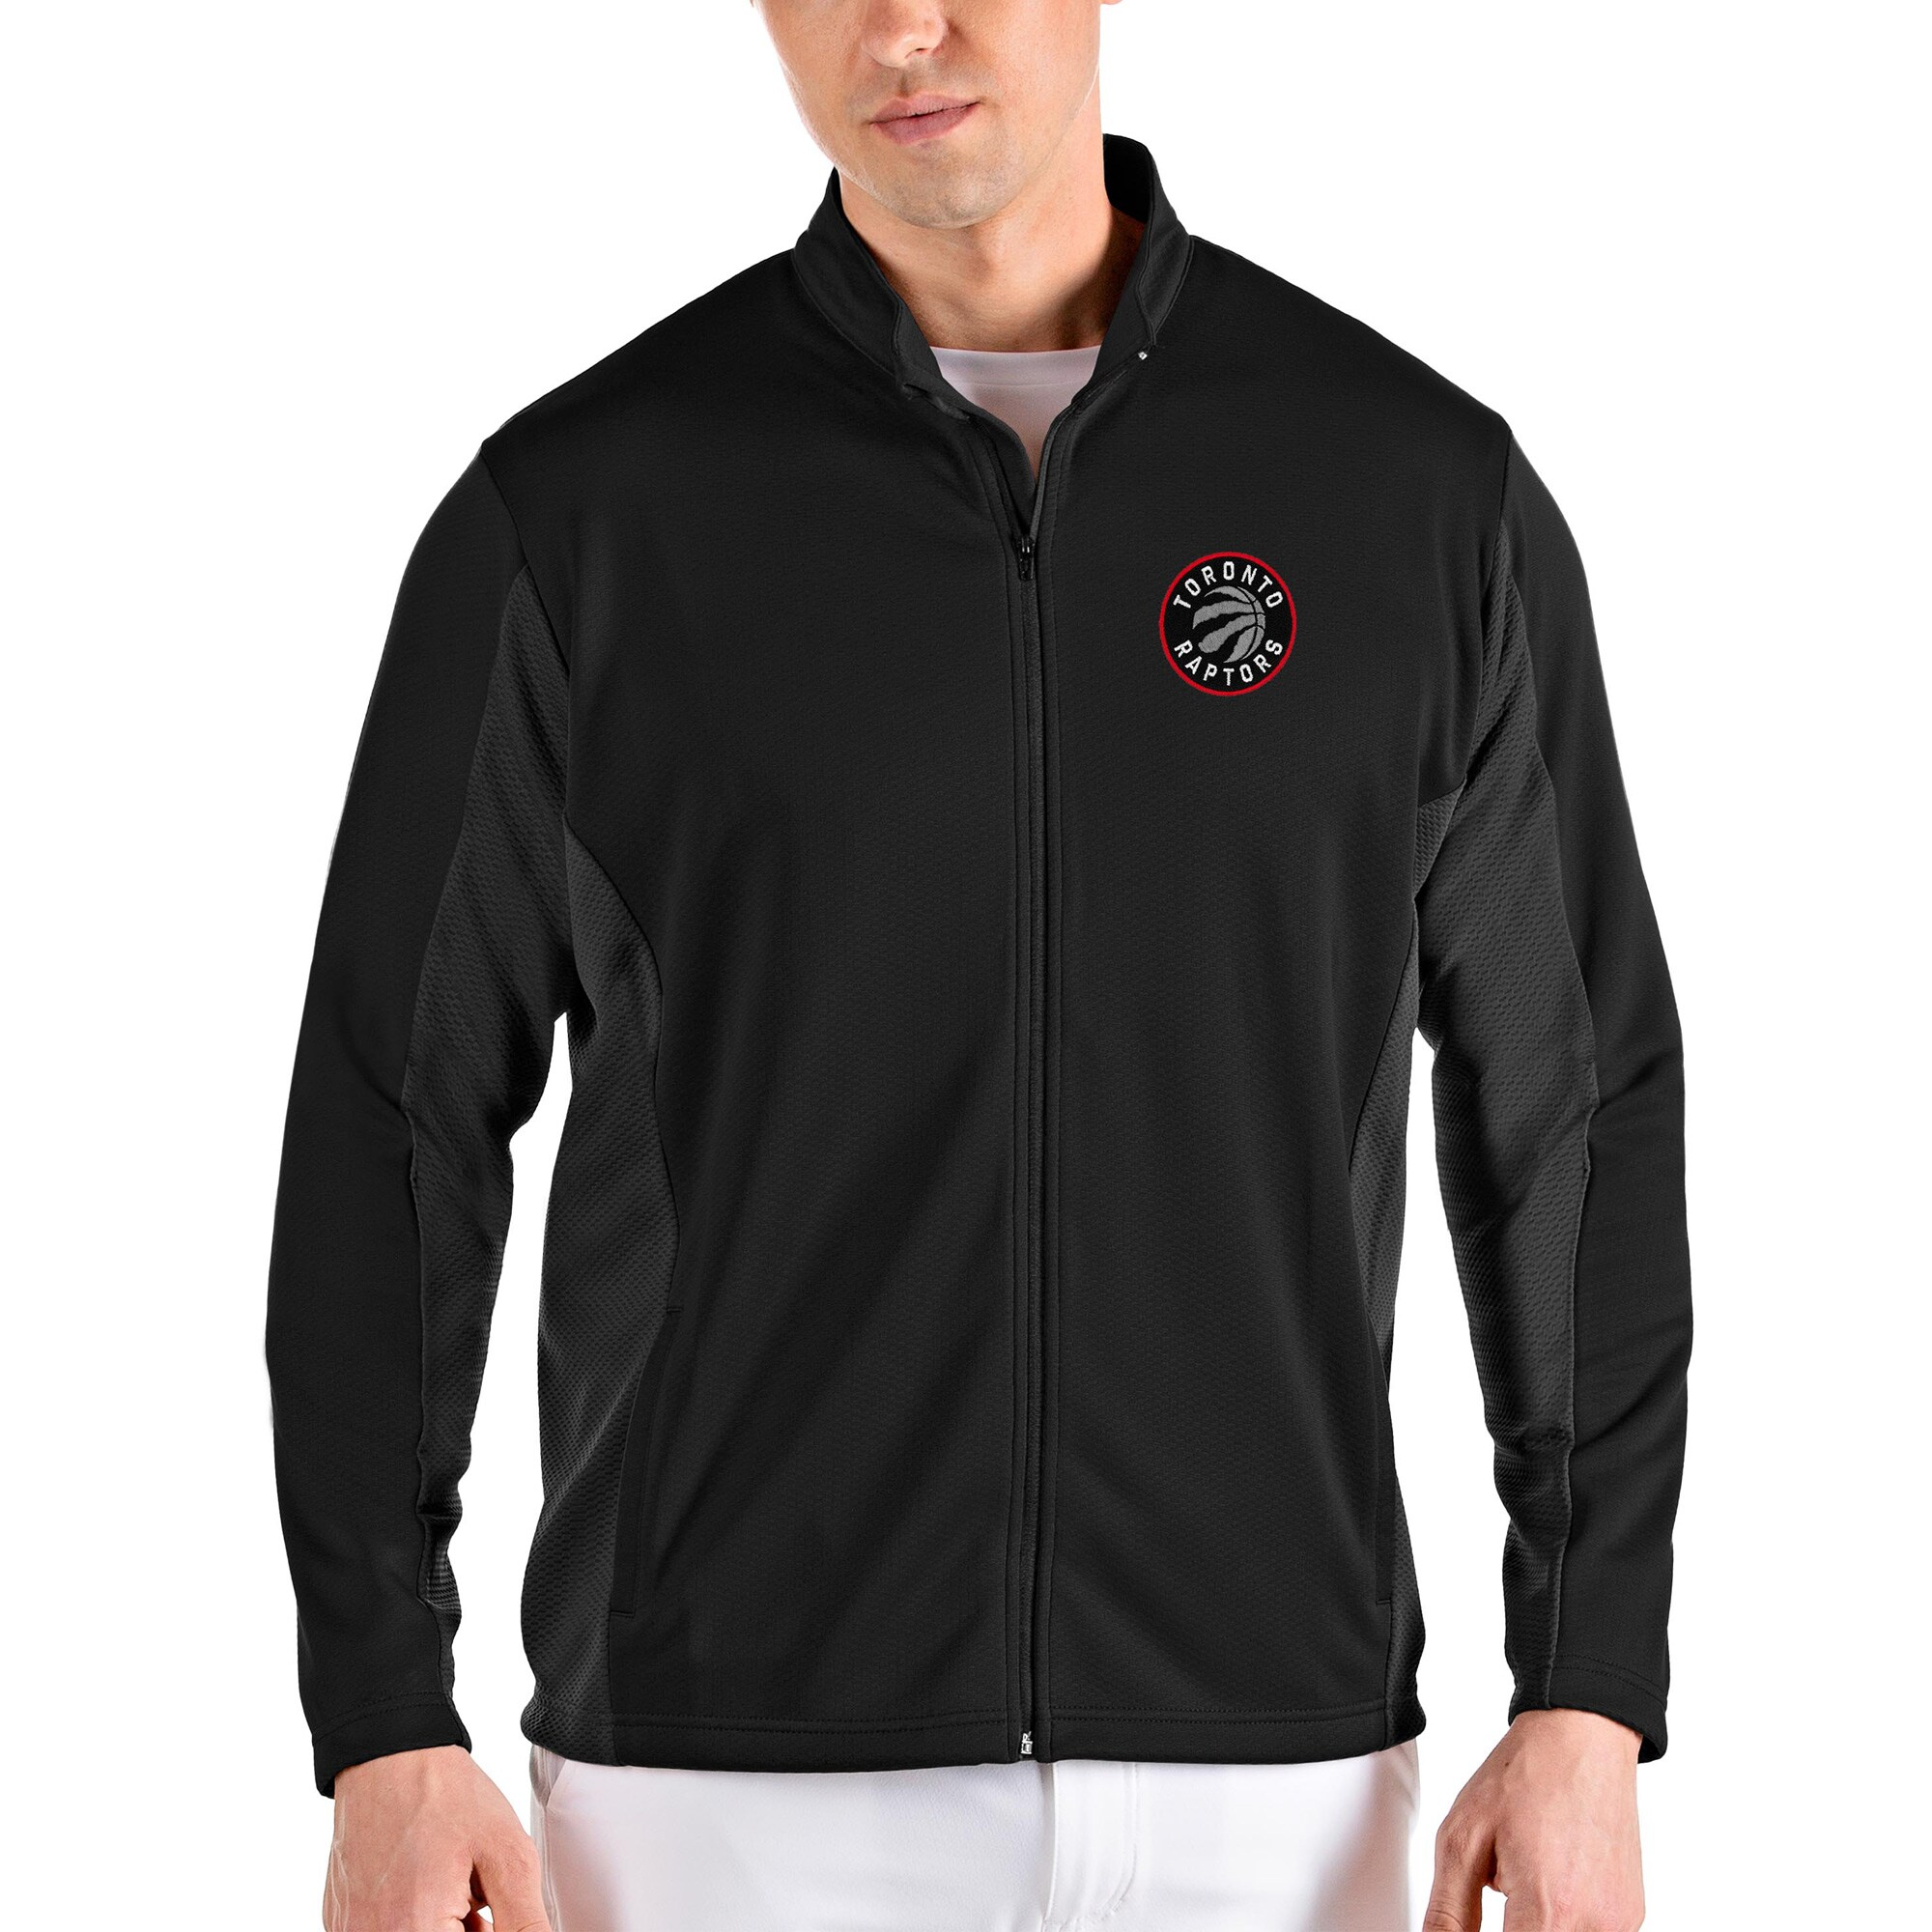 Toronto Raptors Antigua Passage Full-Zip Jacket - Black/Gray